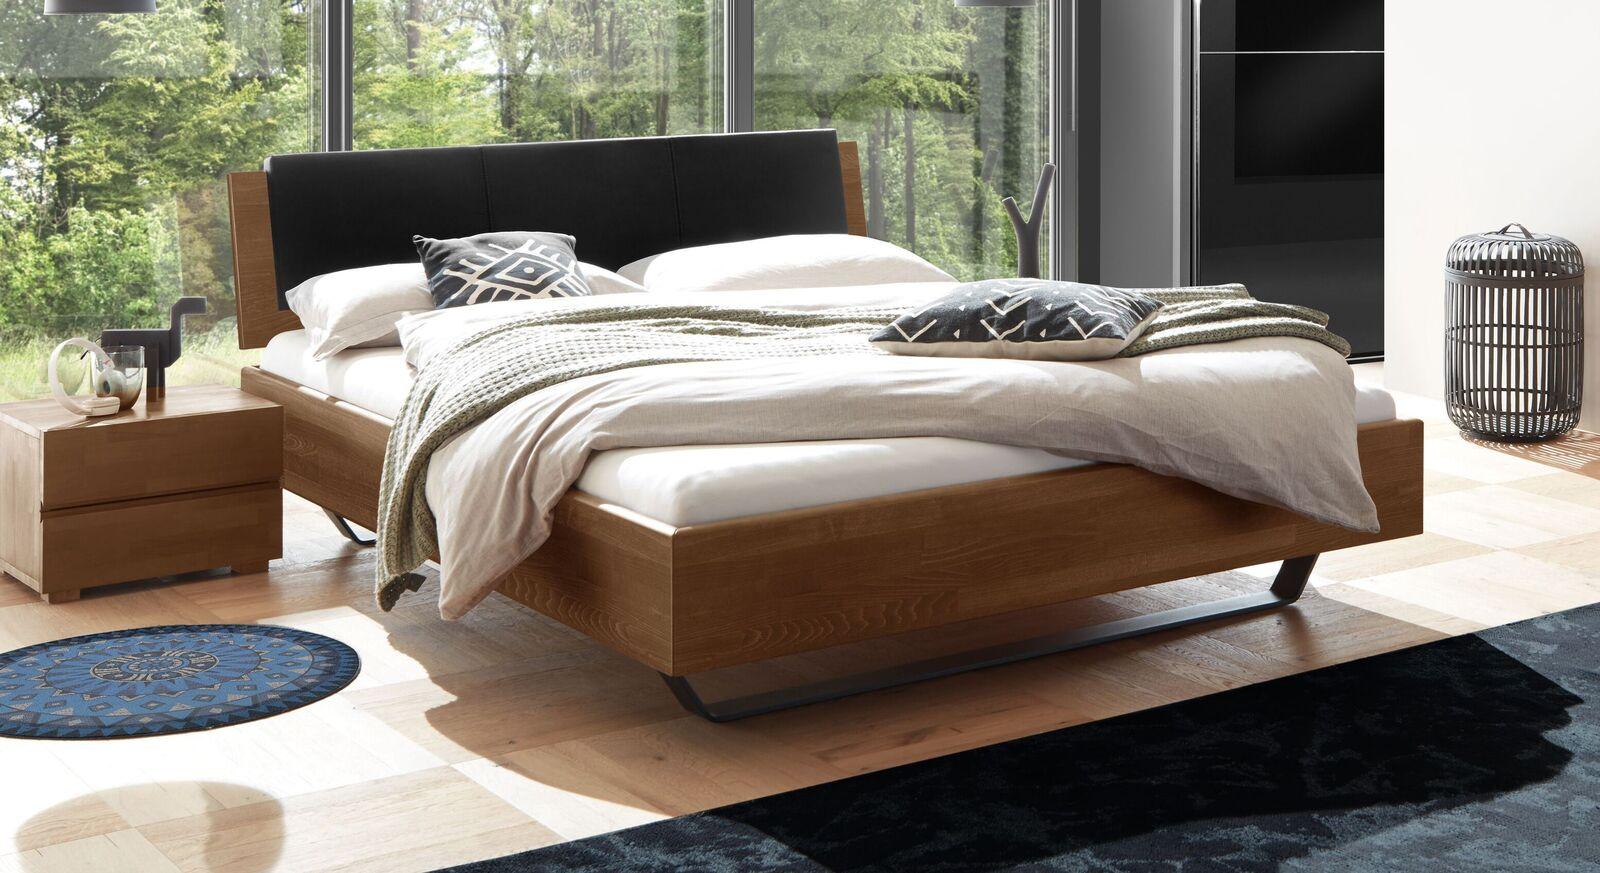 Bett Honoka aus naussbaumfarbenem Buchenholz